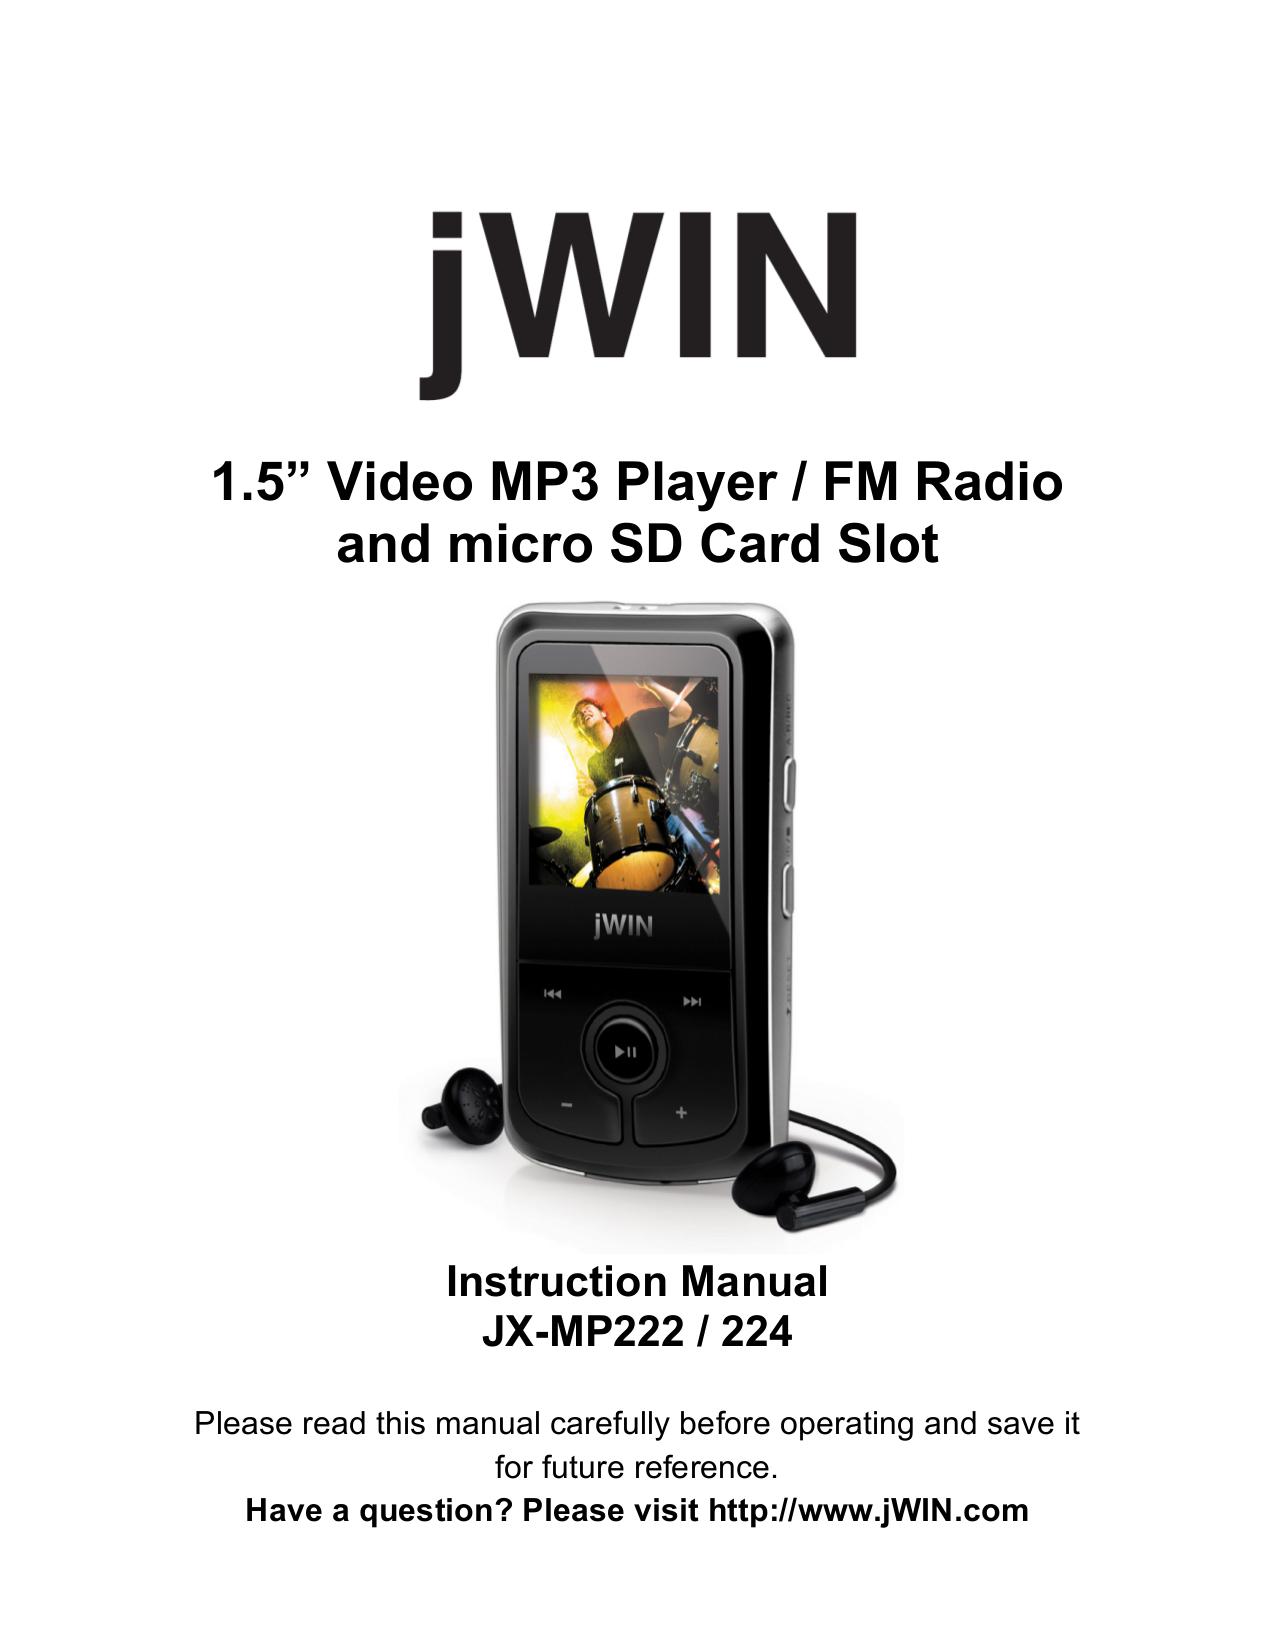 pdf for jWIN MP3 Player JX-MP222 manual